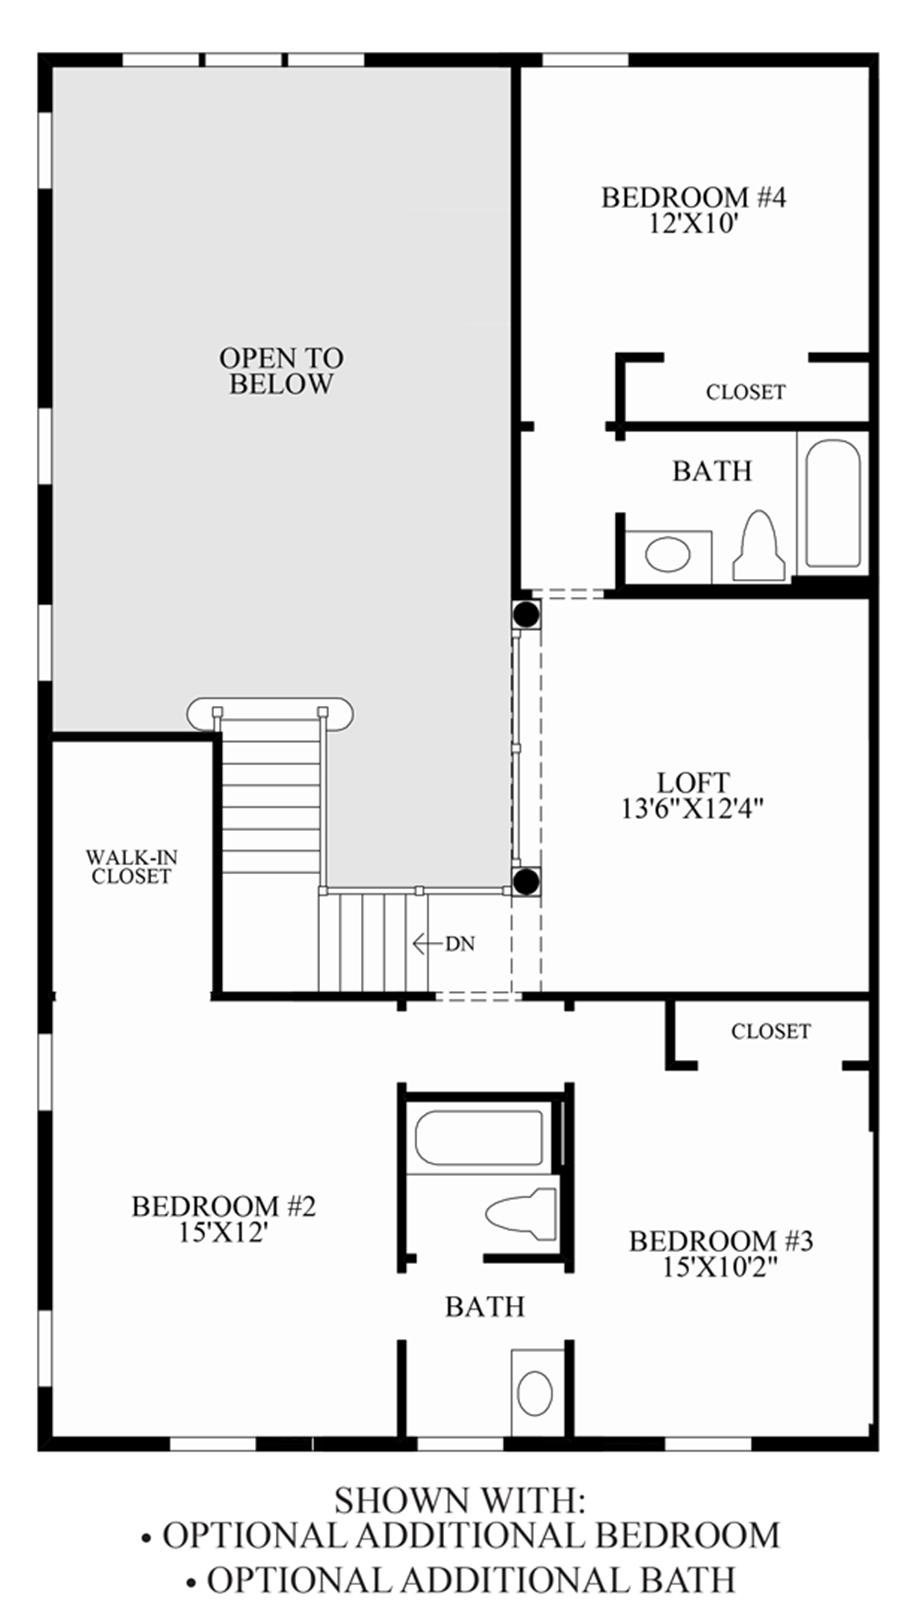 Optional Additional Bedroom Bath Floor Plan